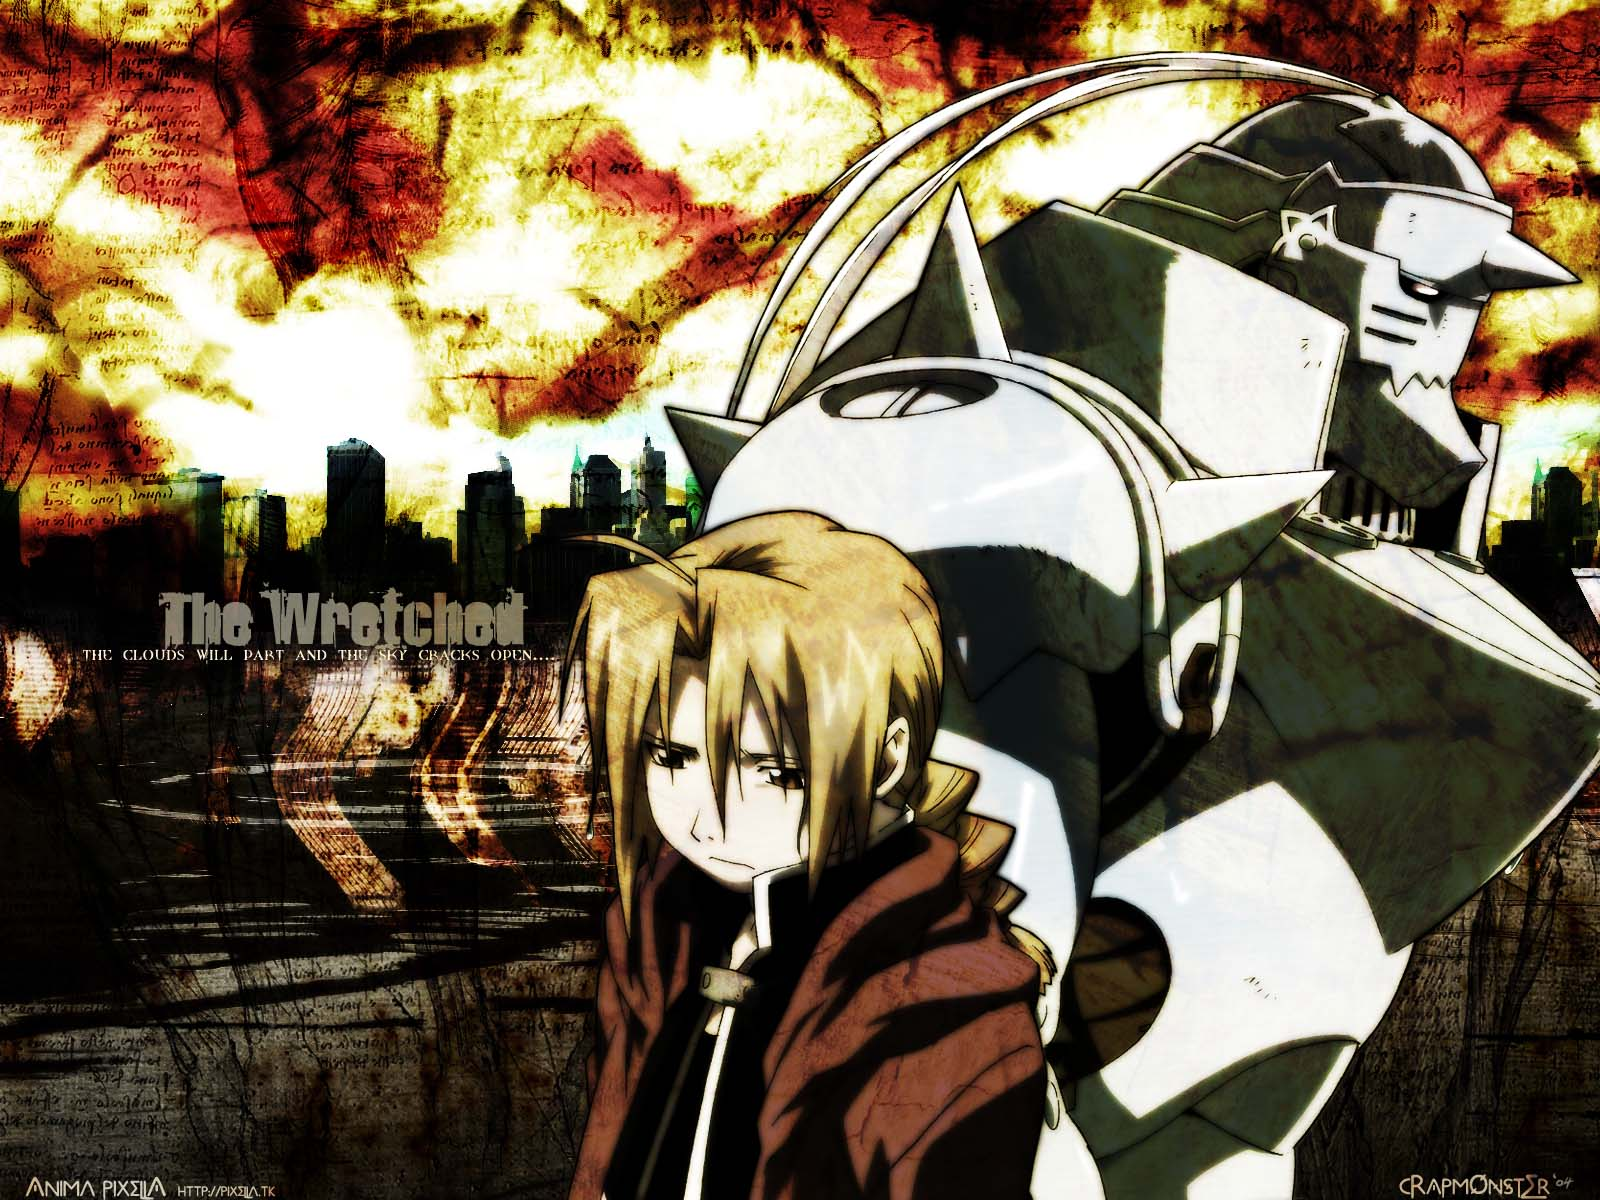 Fullmetal Alchemist Wallpaper: The Wretched (Al & Ed) - Minitokyo